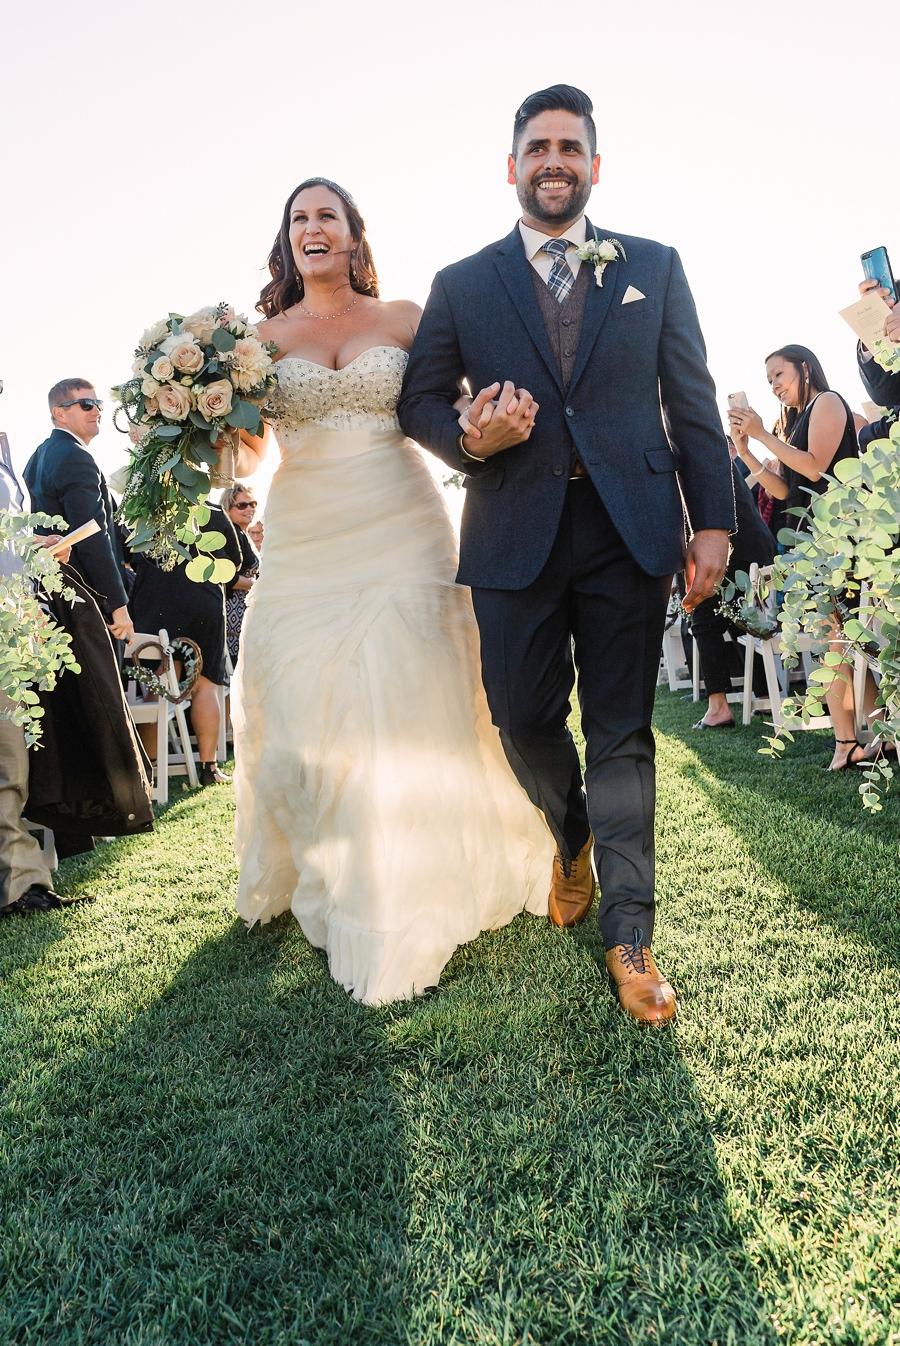 Liancarlo - Brides for a Cause Portland wedding gown by Heather Elizabeth Photography